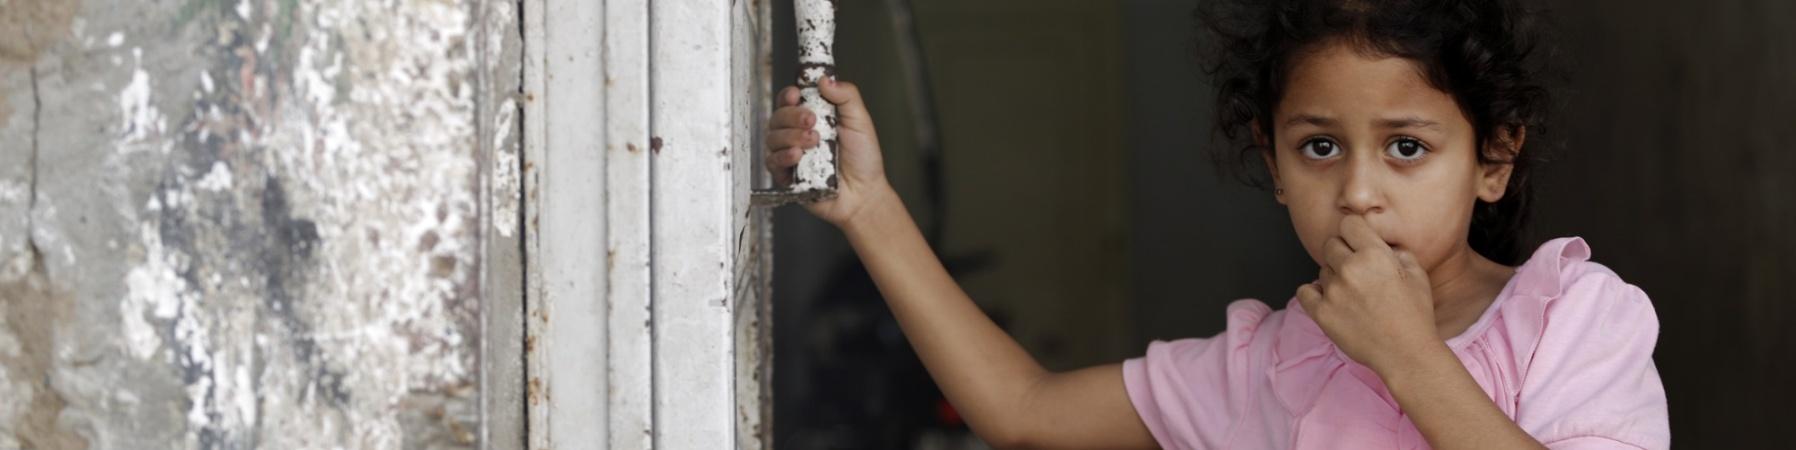 Bambina striscia di Gaza